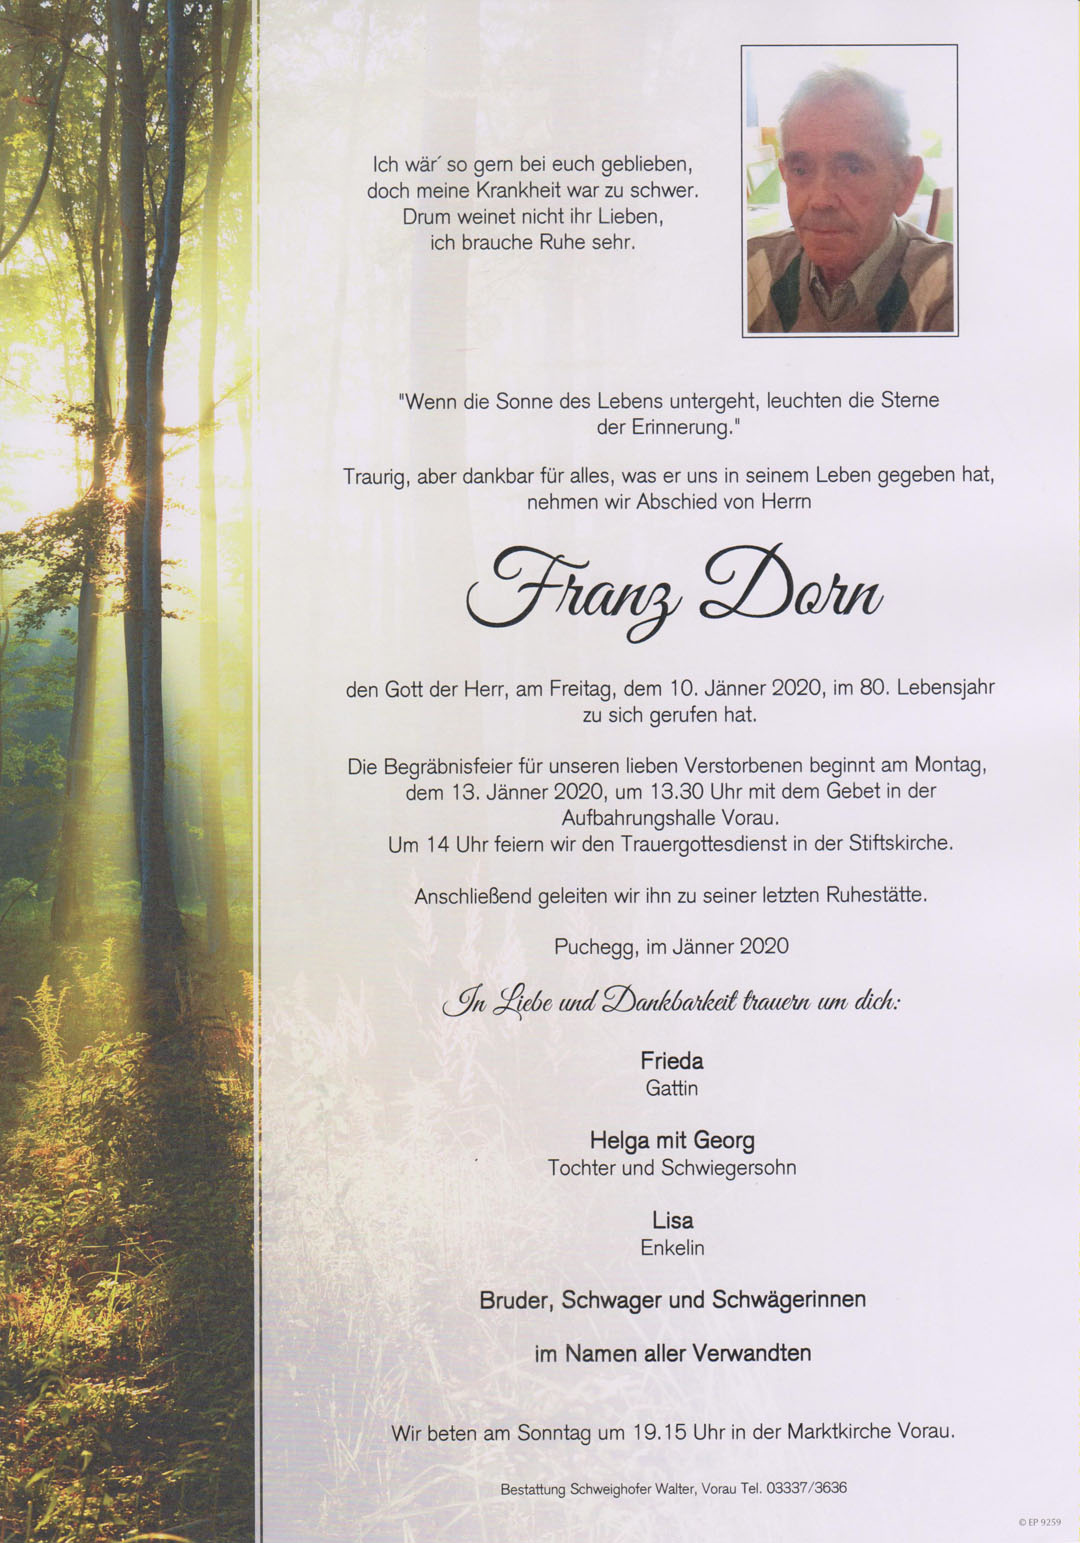 Franz Dorn